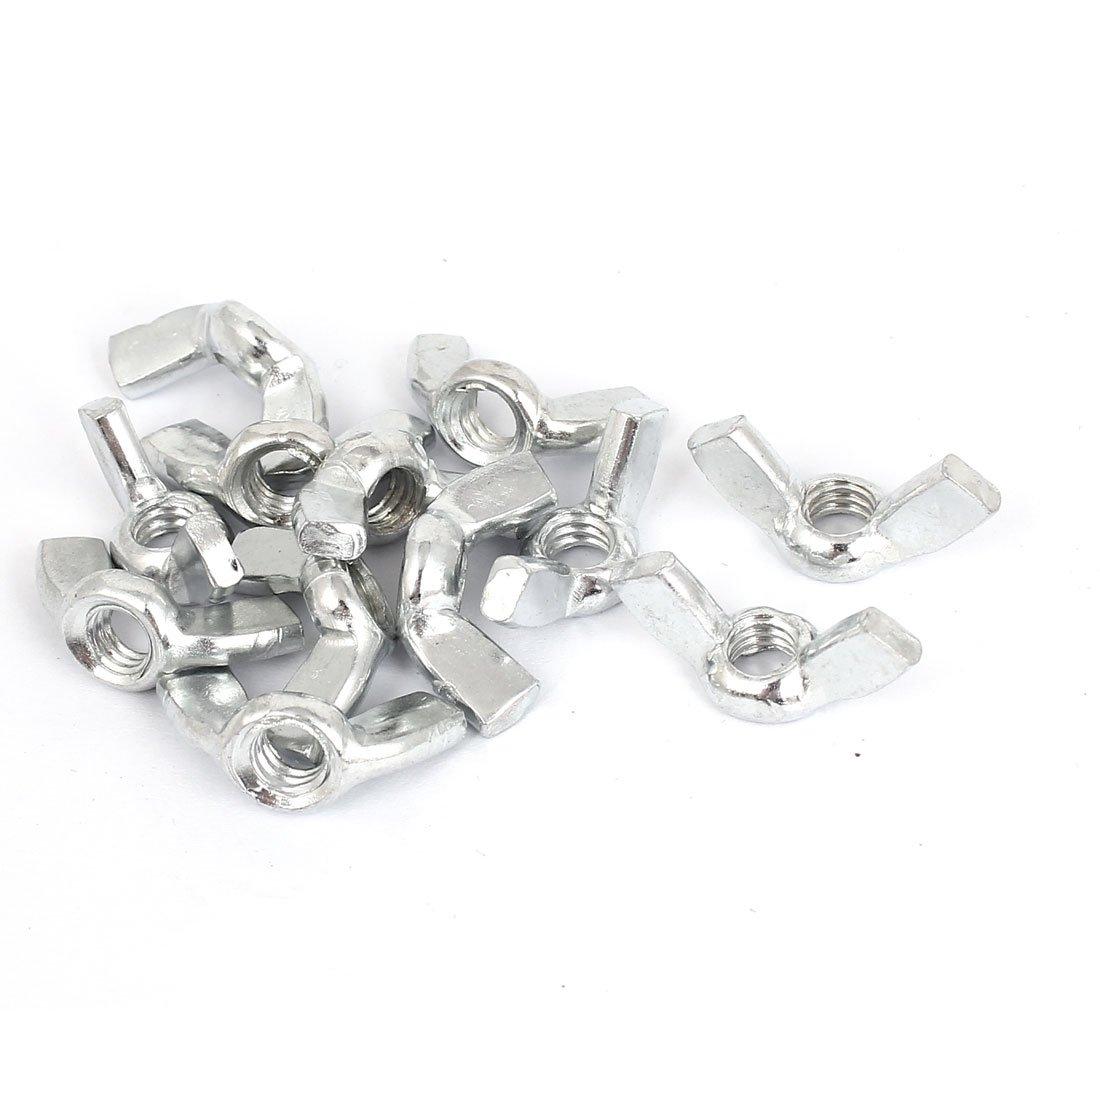 10 Pcs Carbon Steel Zinc Plated Hand Twist Tighten Ear Butterfly Nut uxcell 1//2-12 Wing Nuts